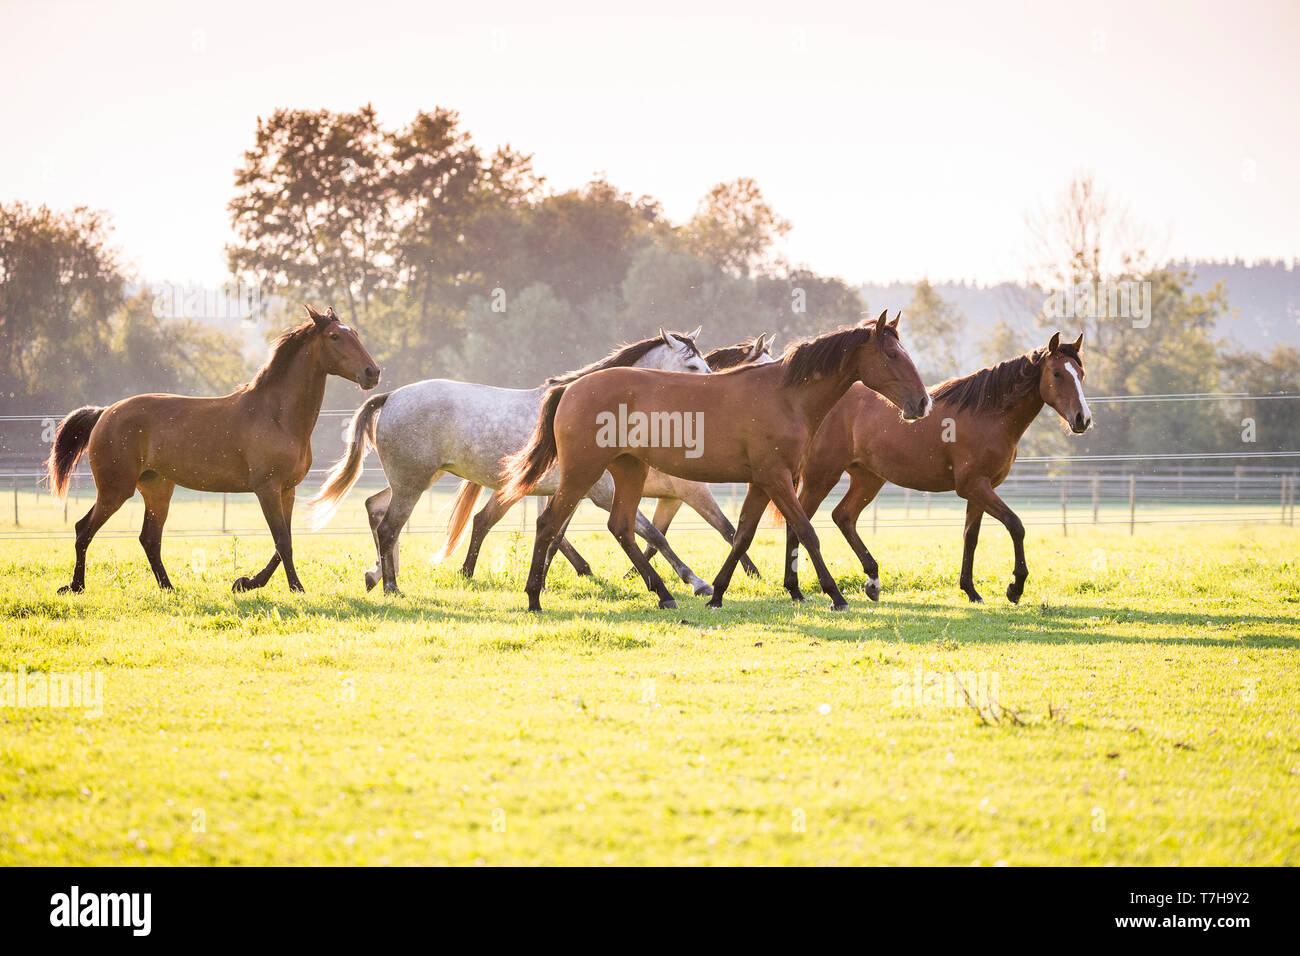 Lusitano. Juvenile mares walking on a pasture. Germany - Stock Image